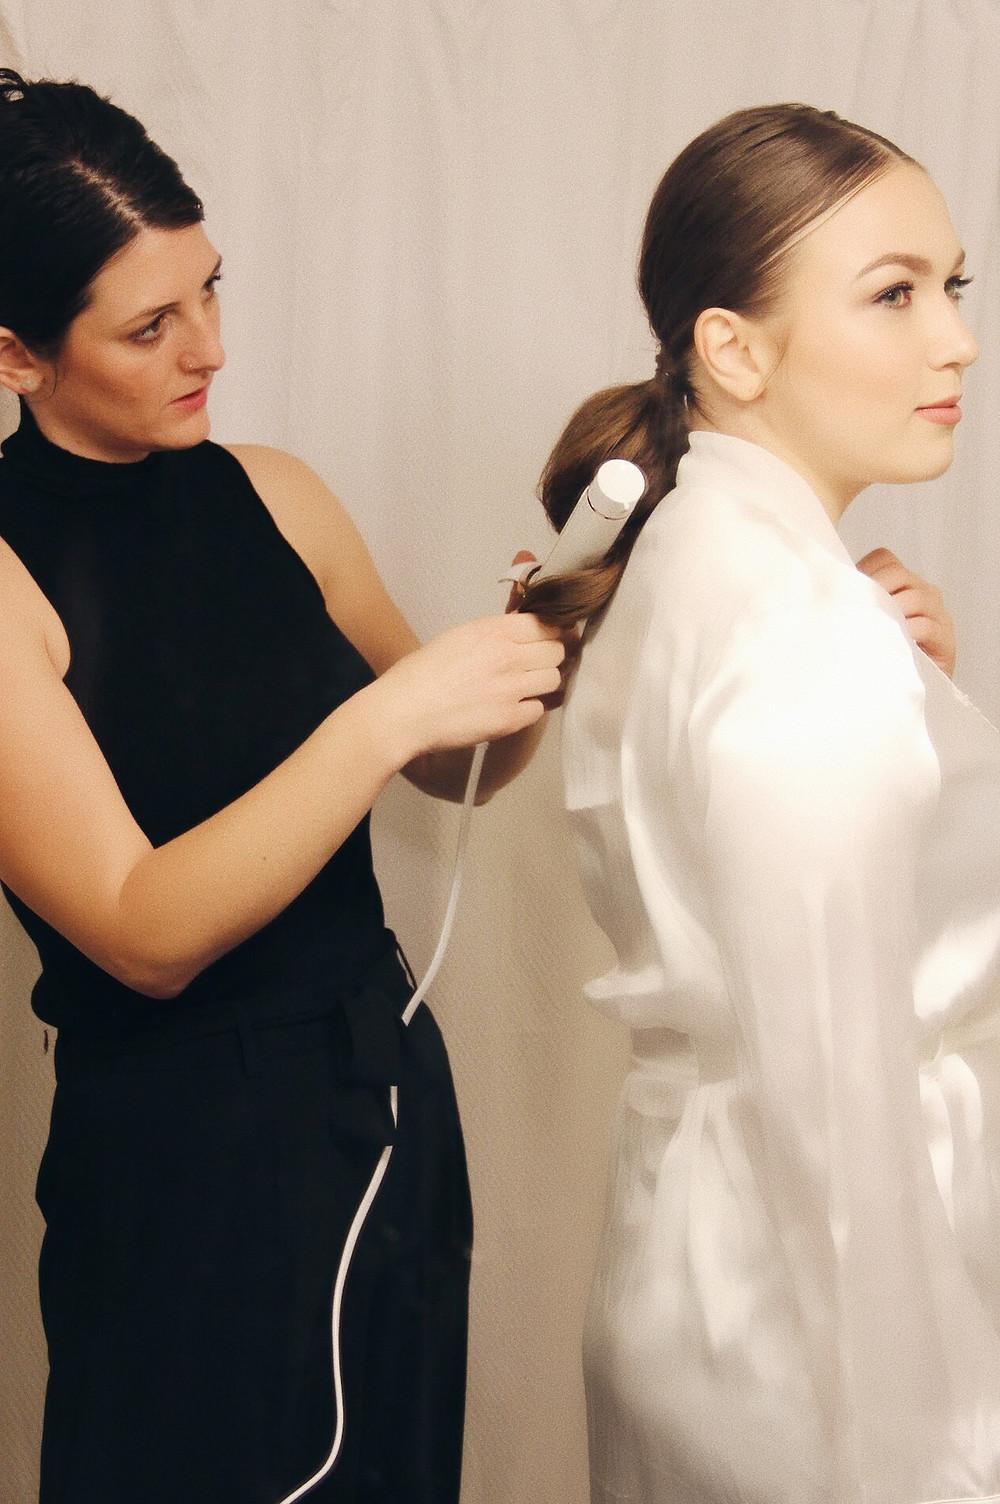 Bridal Hair and Makeup in Los Angeles